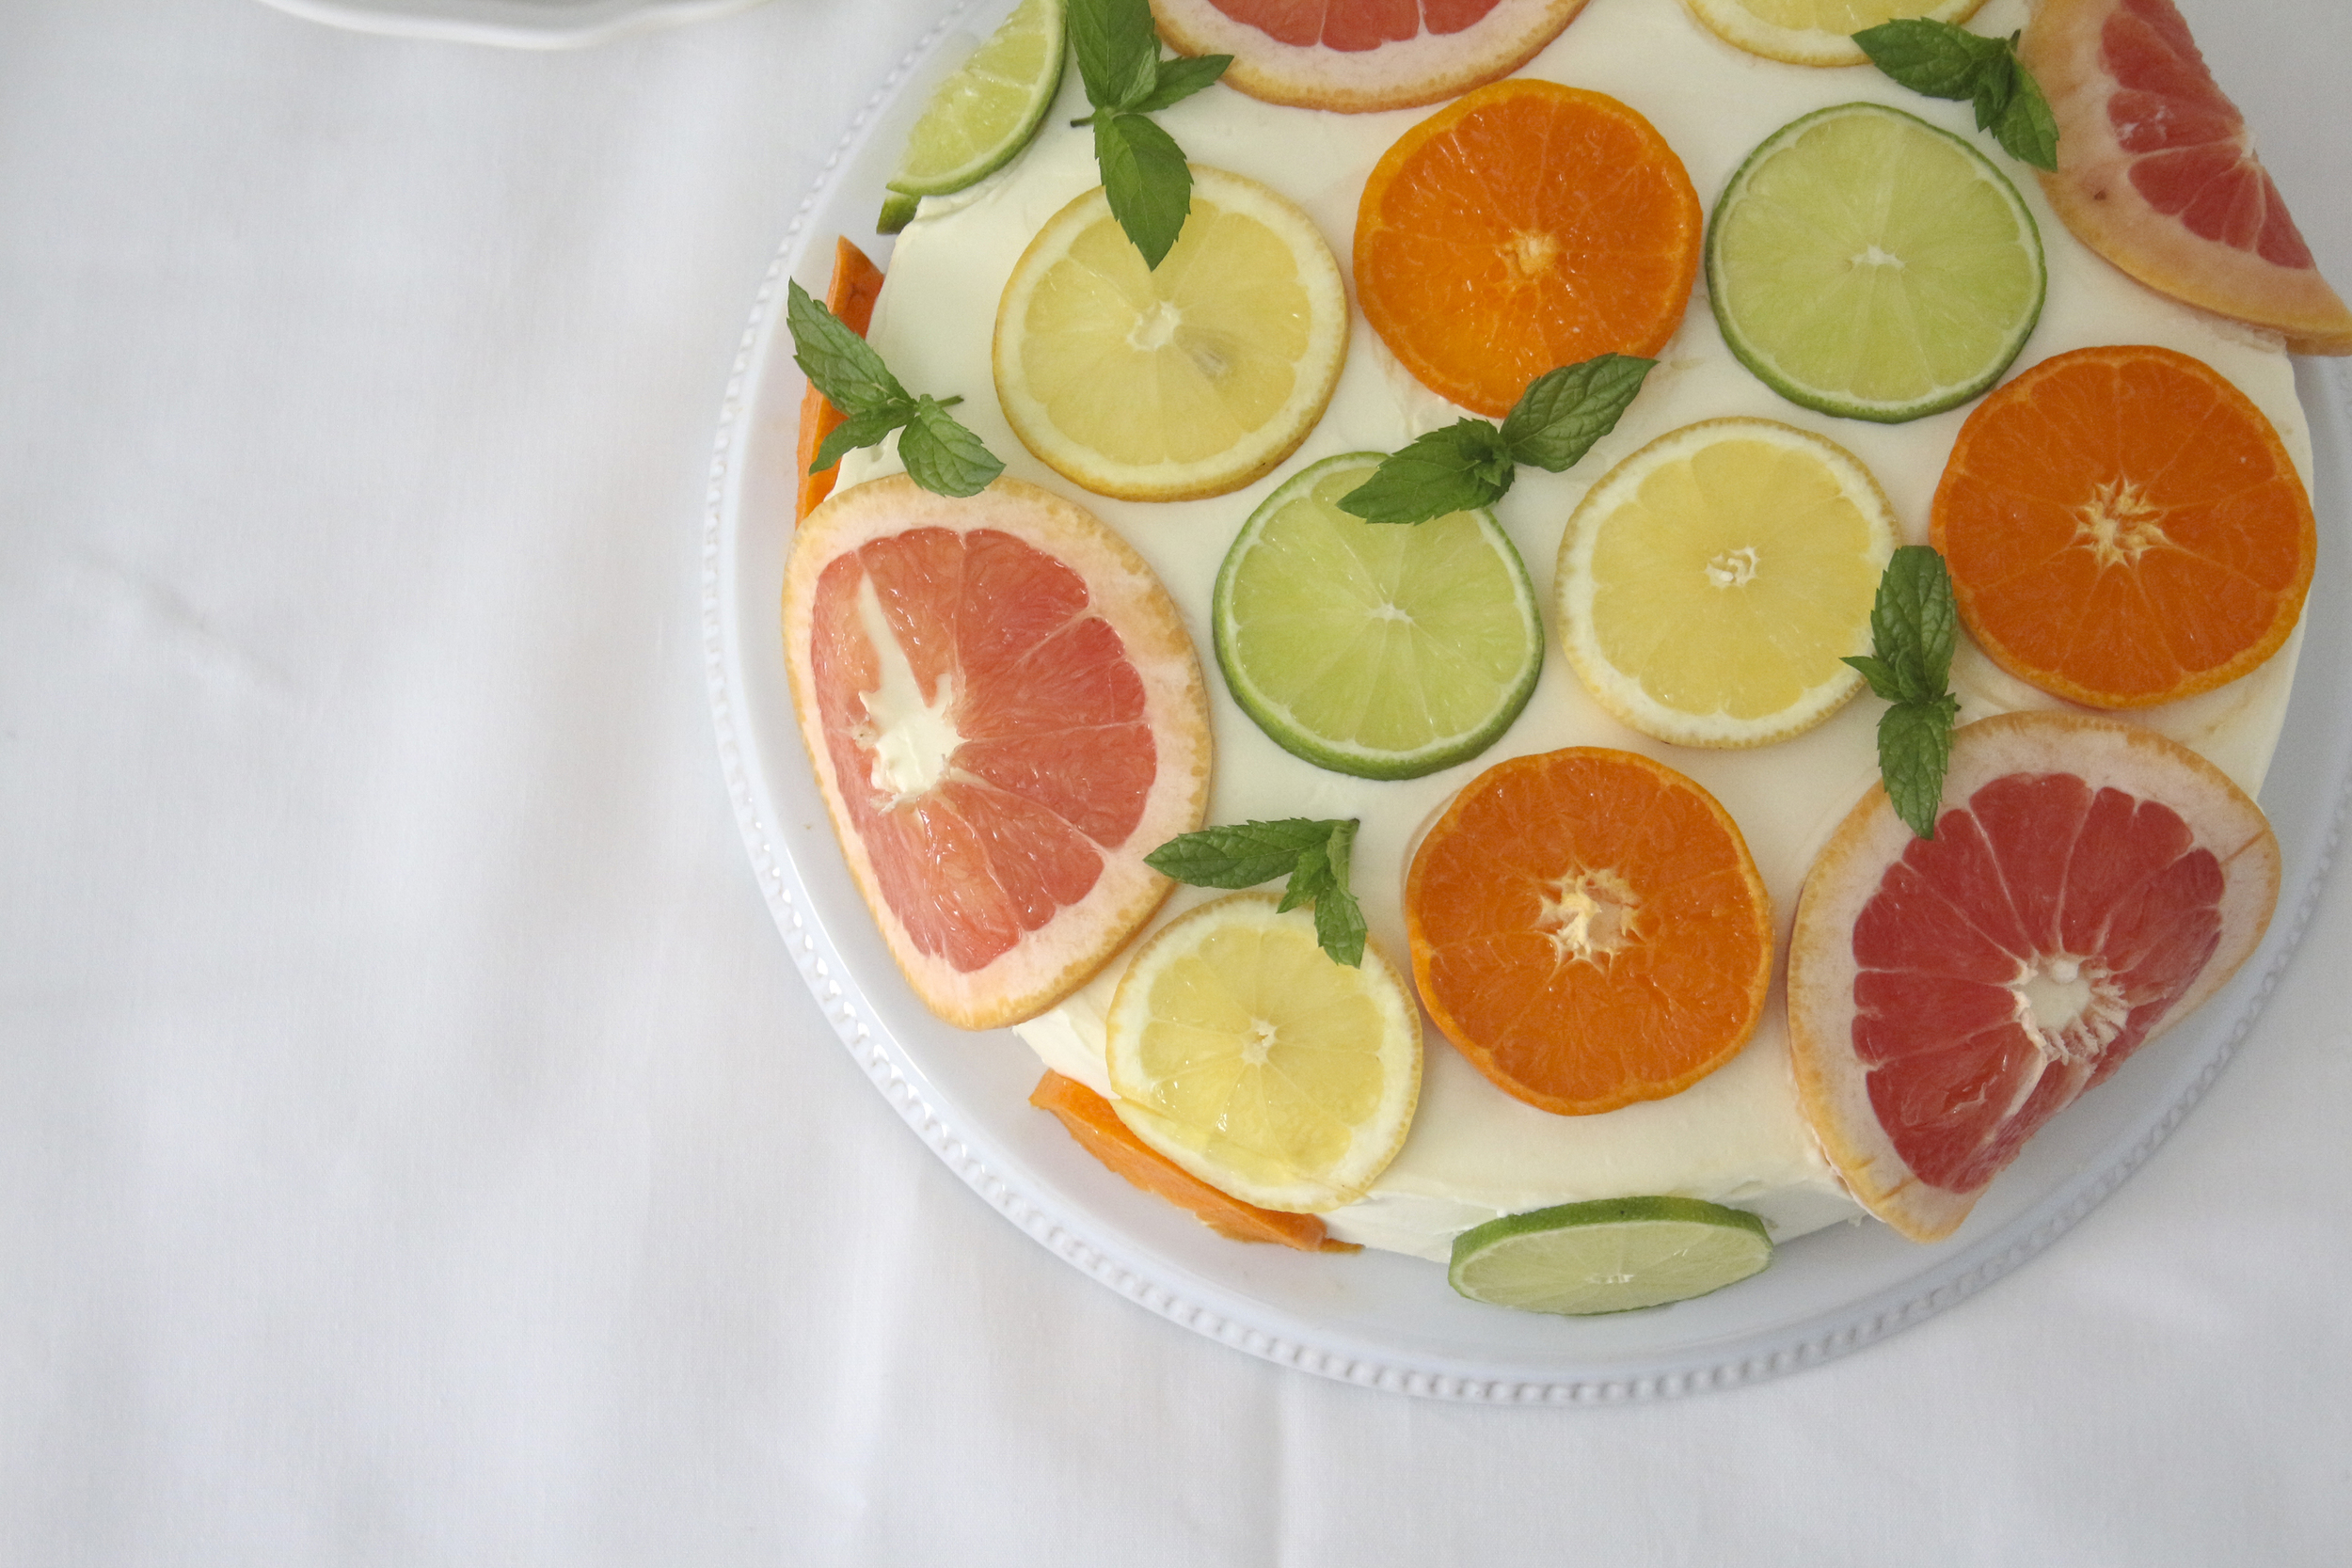 Coconut Cake with Citrus5